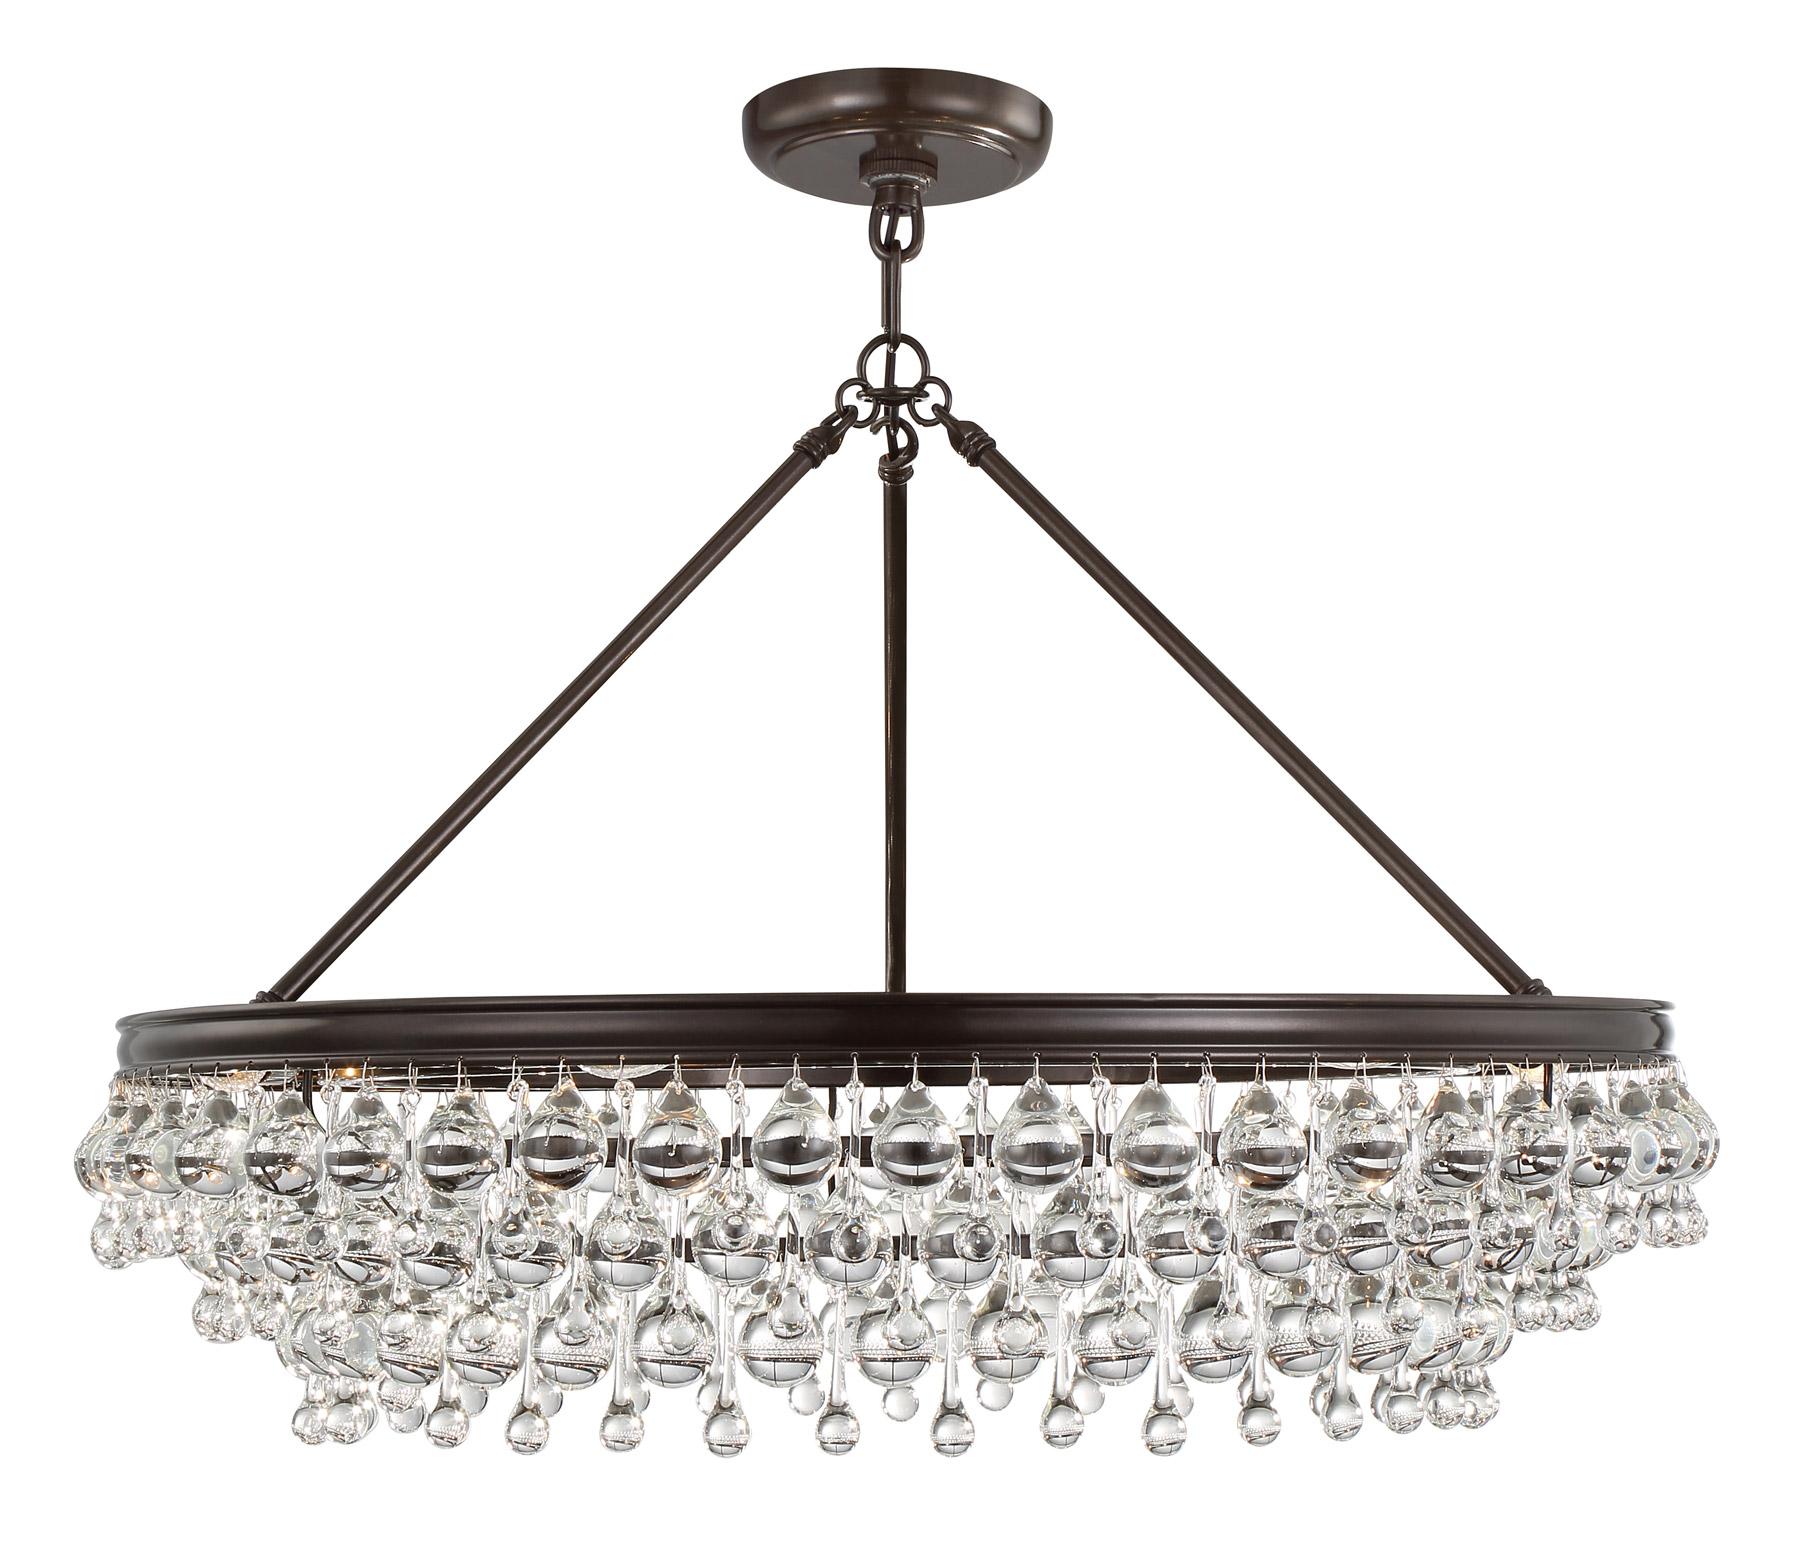 Crystorama 275 vz calypso 6 light crystal teardrop bronze chandelier aloadofball Gallery